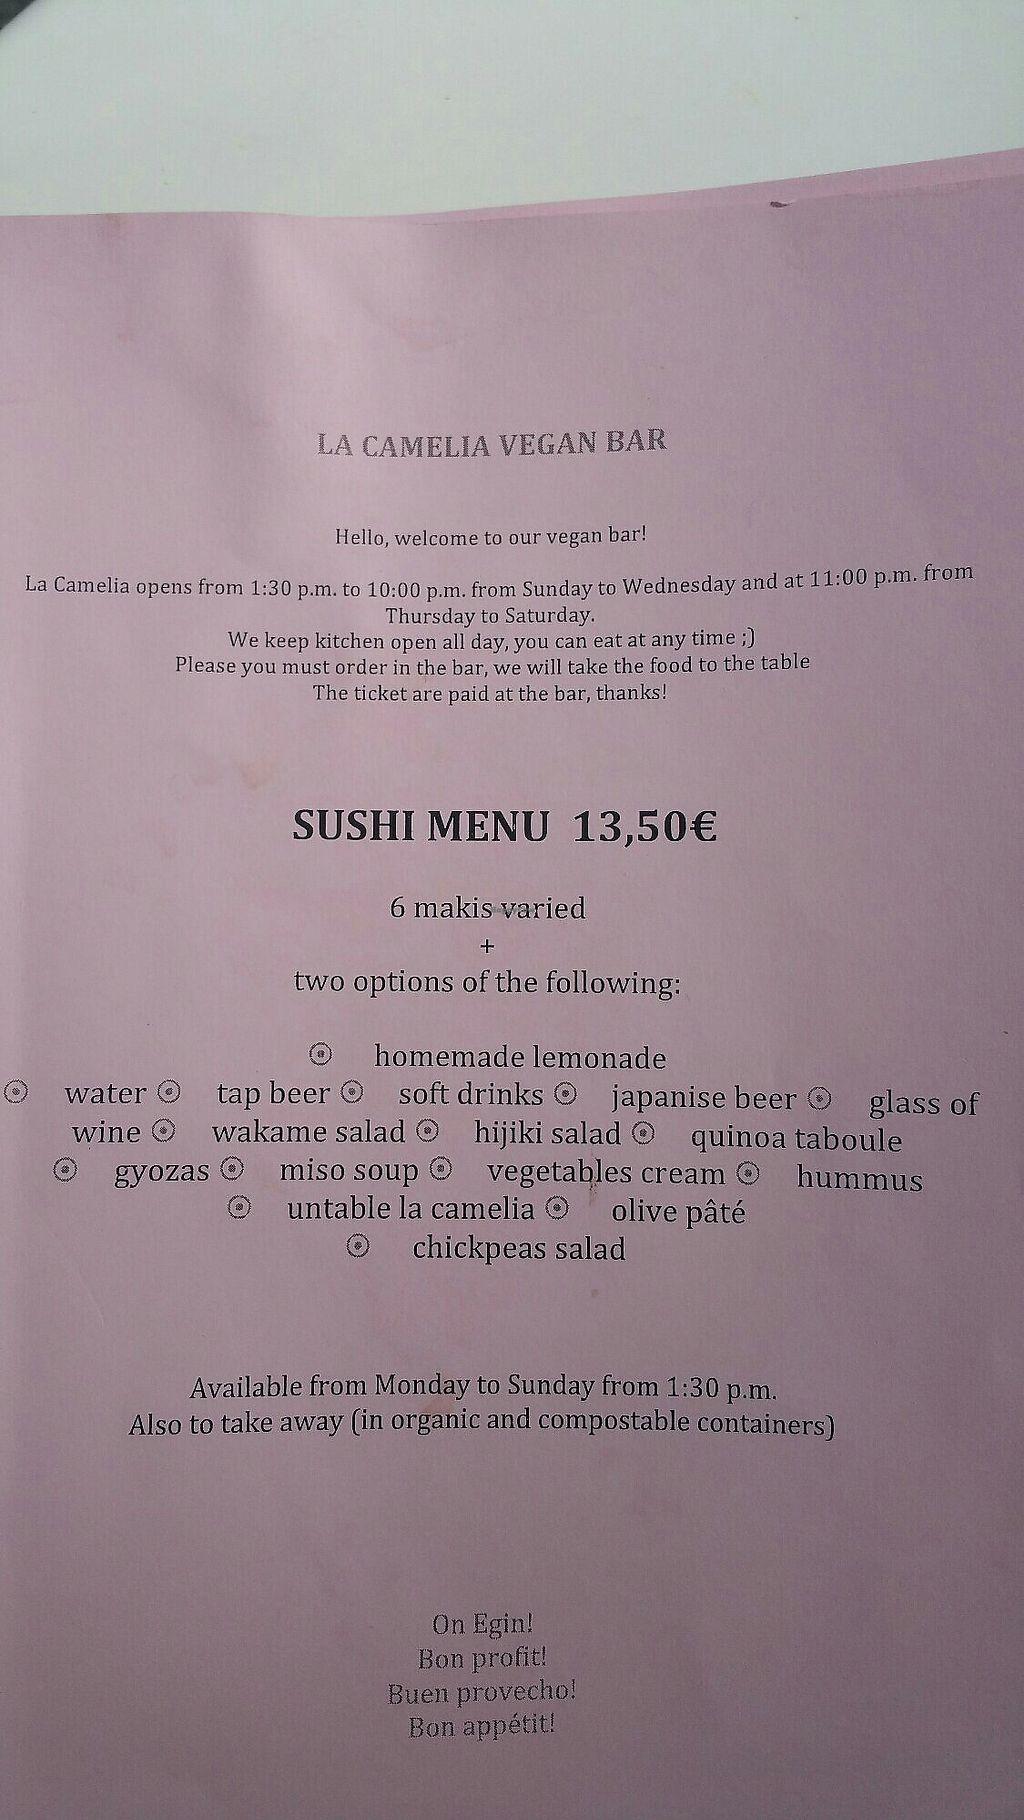 La Camelia Vegan Bar Bilbao Restaurant Happycow